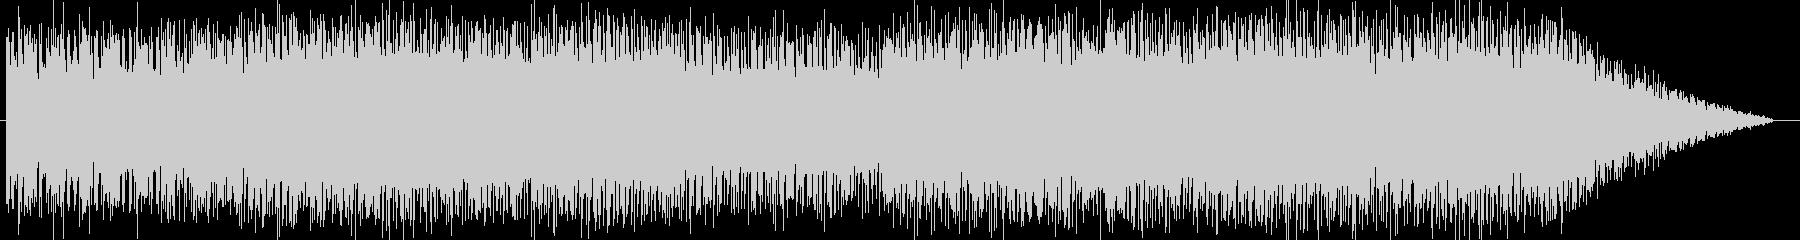 「HR/HM」「DARK系」BGM14の未再生の波形